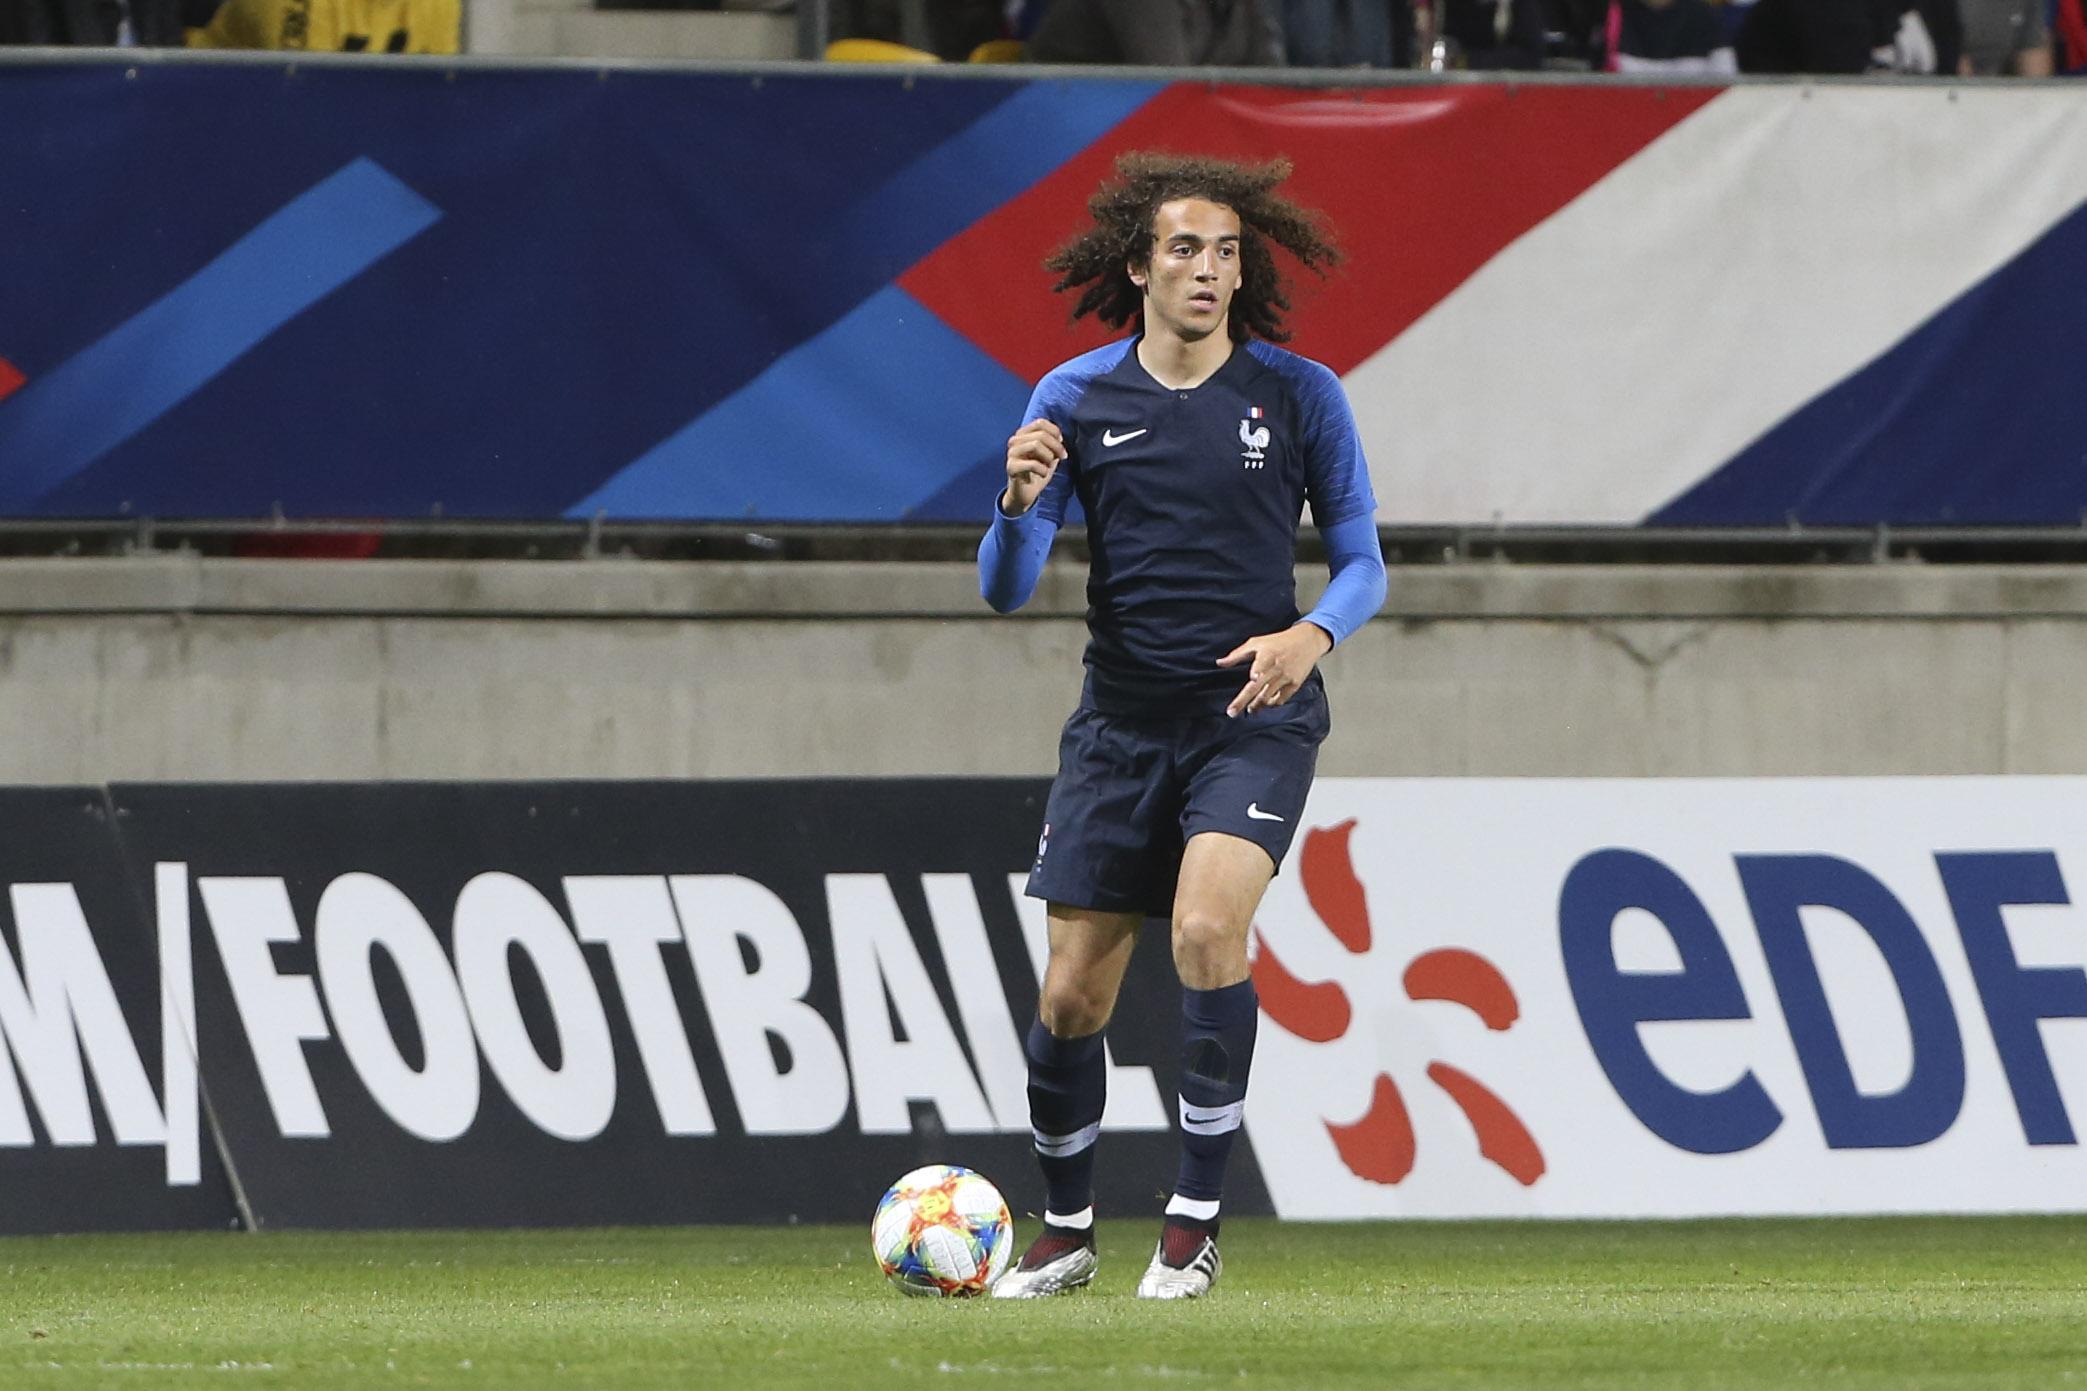 Football - Equipe de France - Les Bleuets en quête de titre